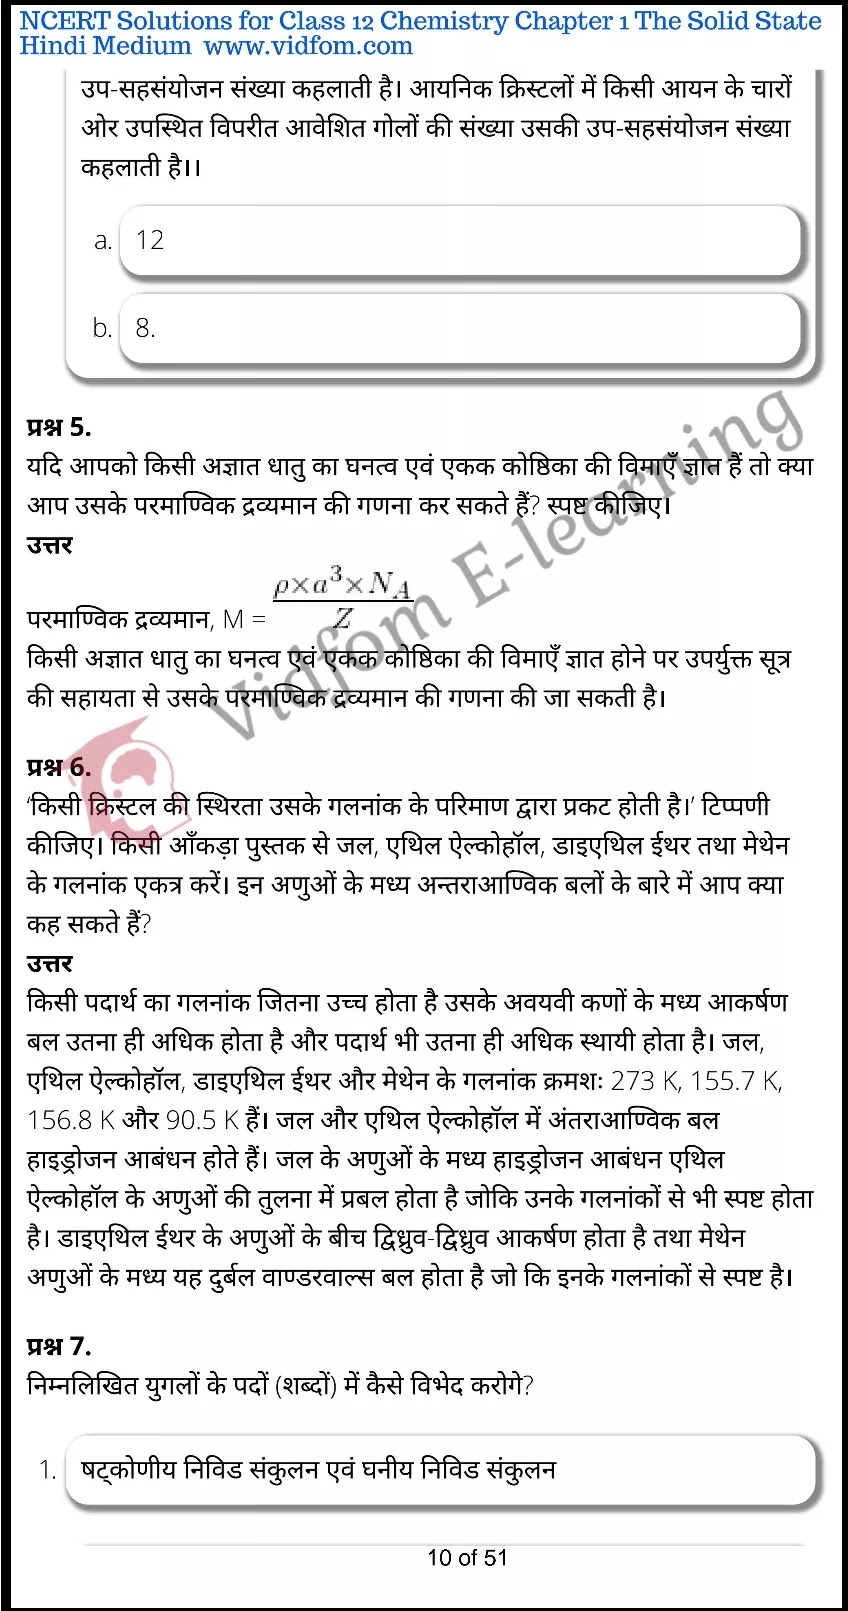 class 12 chemistry chapter 1 light hindi medium 10